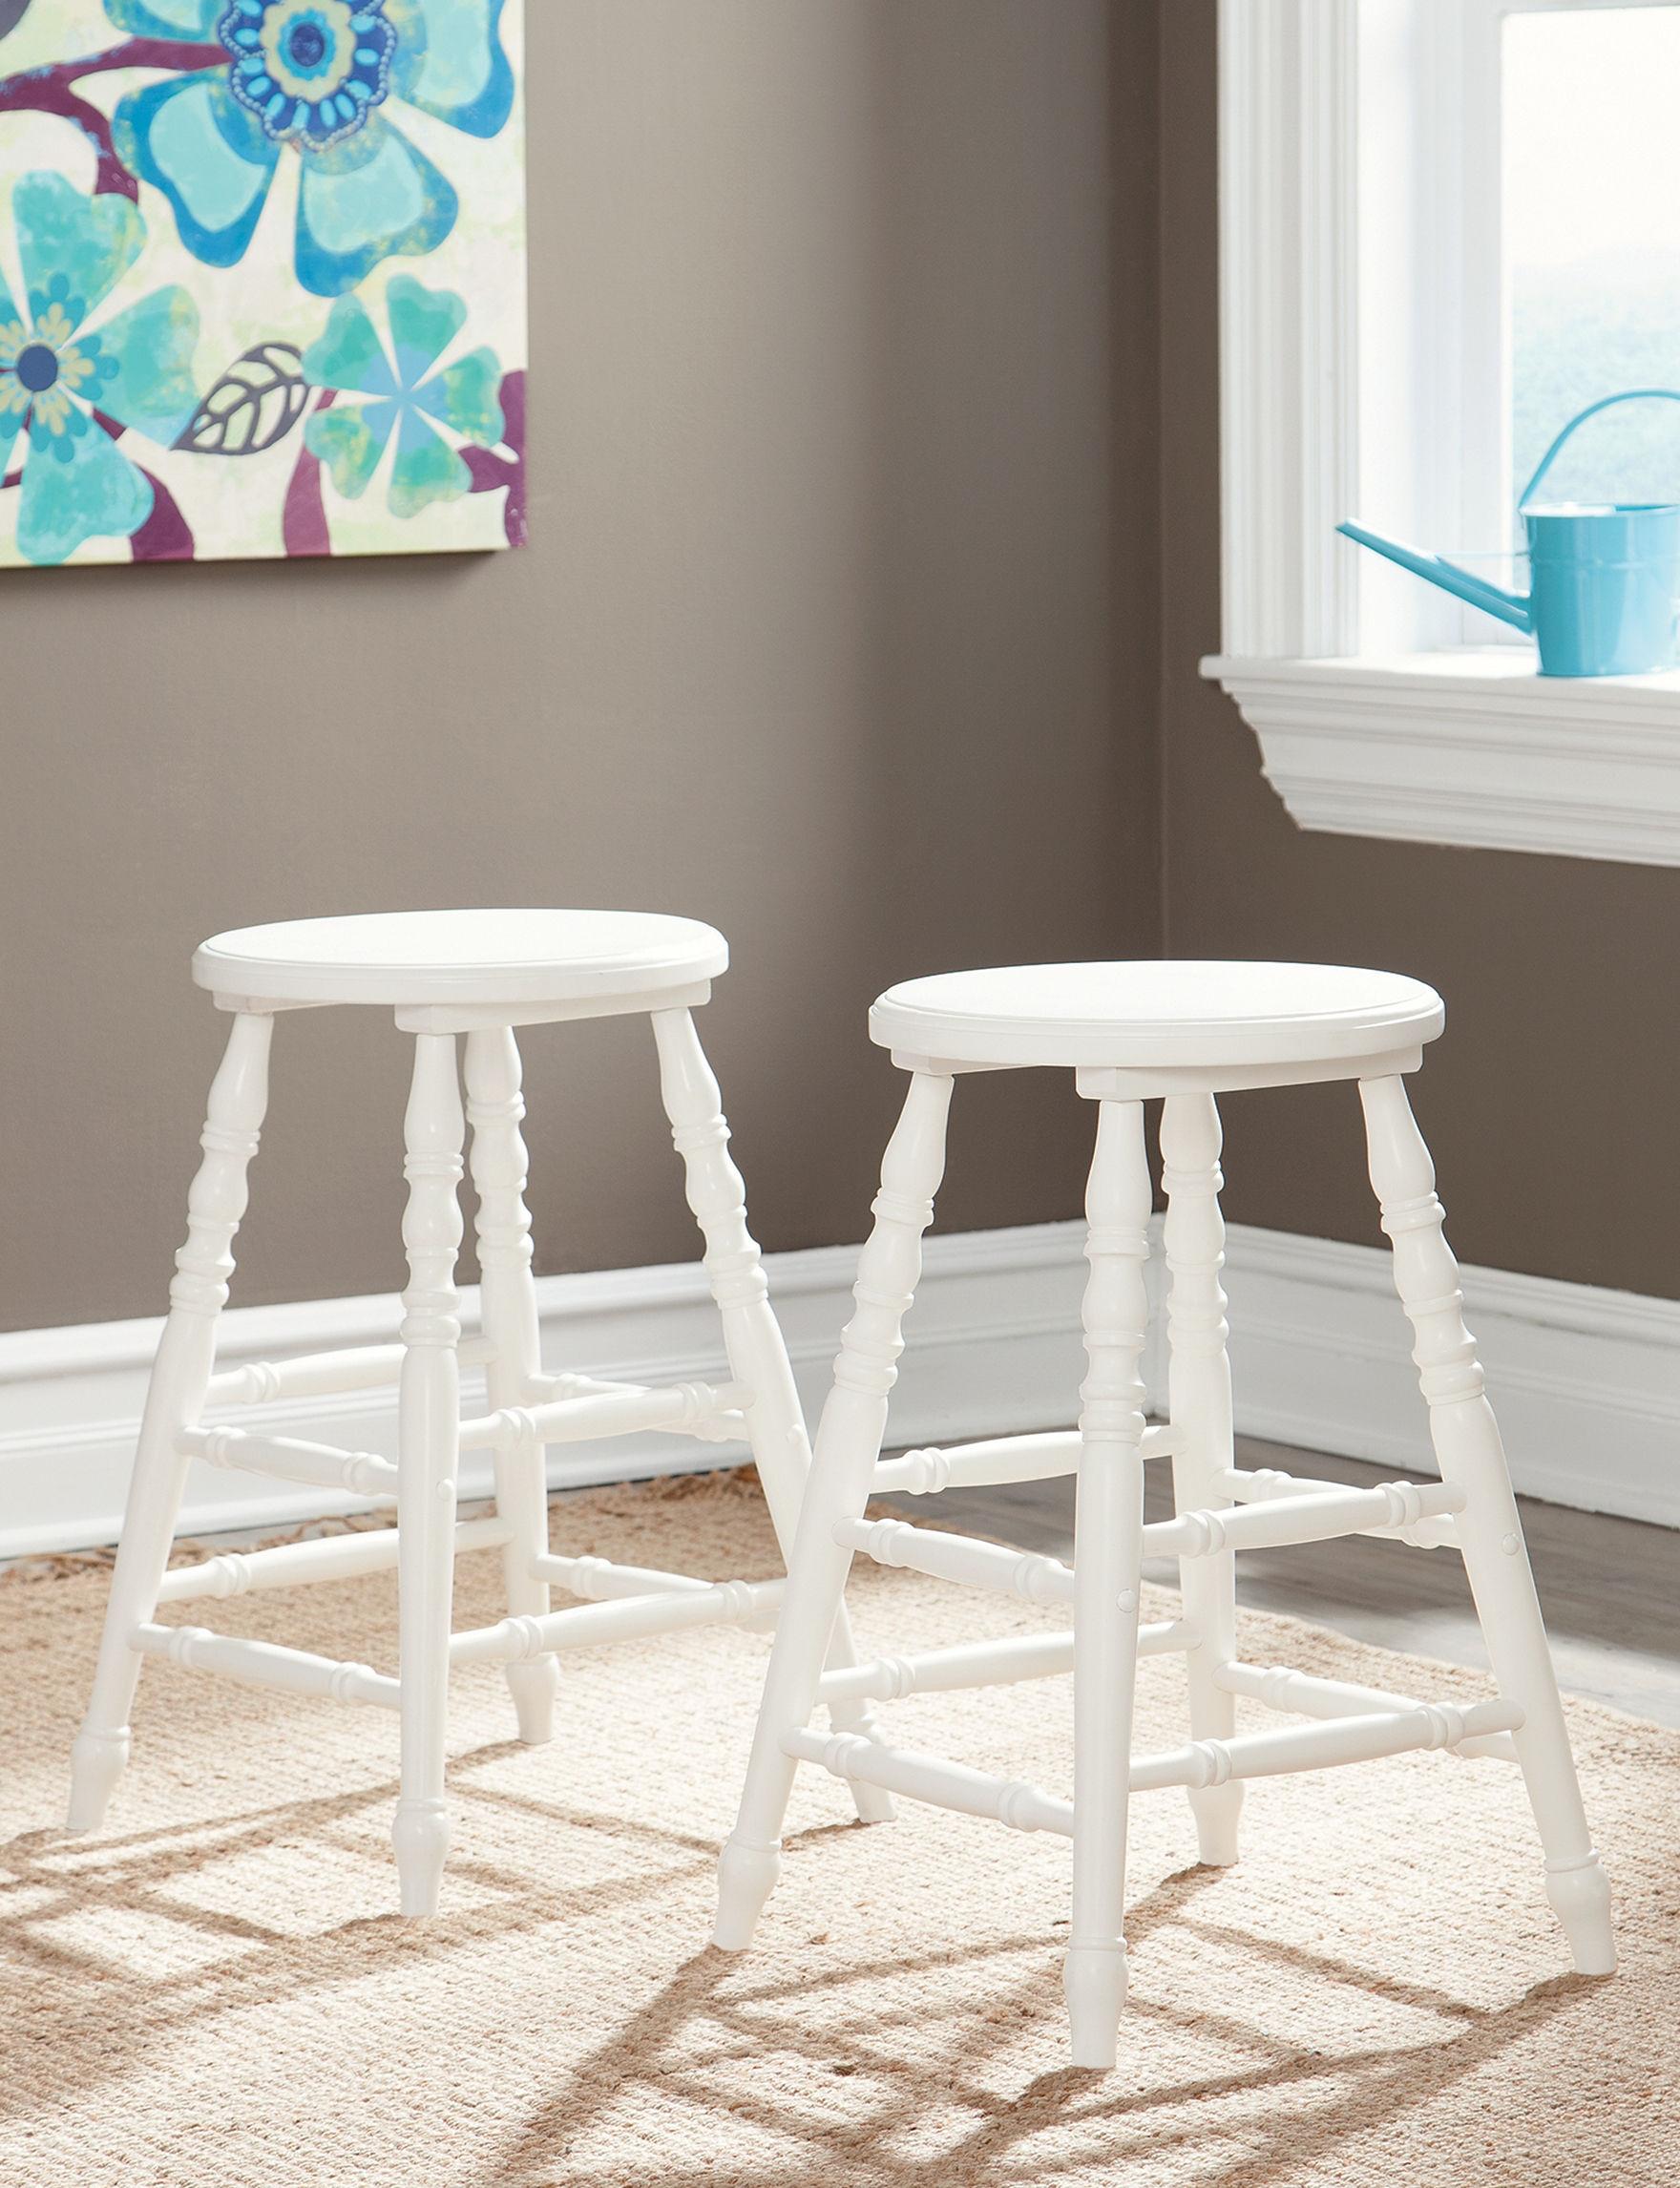 Sauder White Bar & Kitchen Stools Kitchen & Dining Furniture